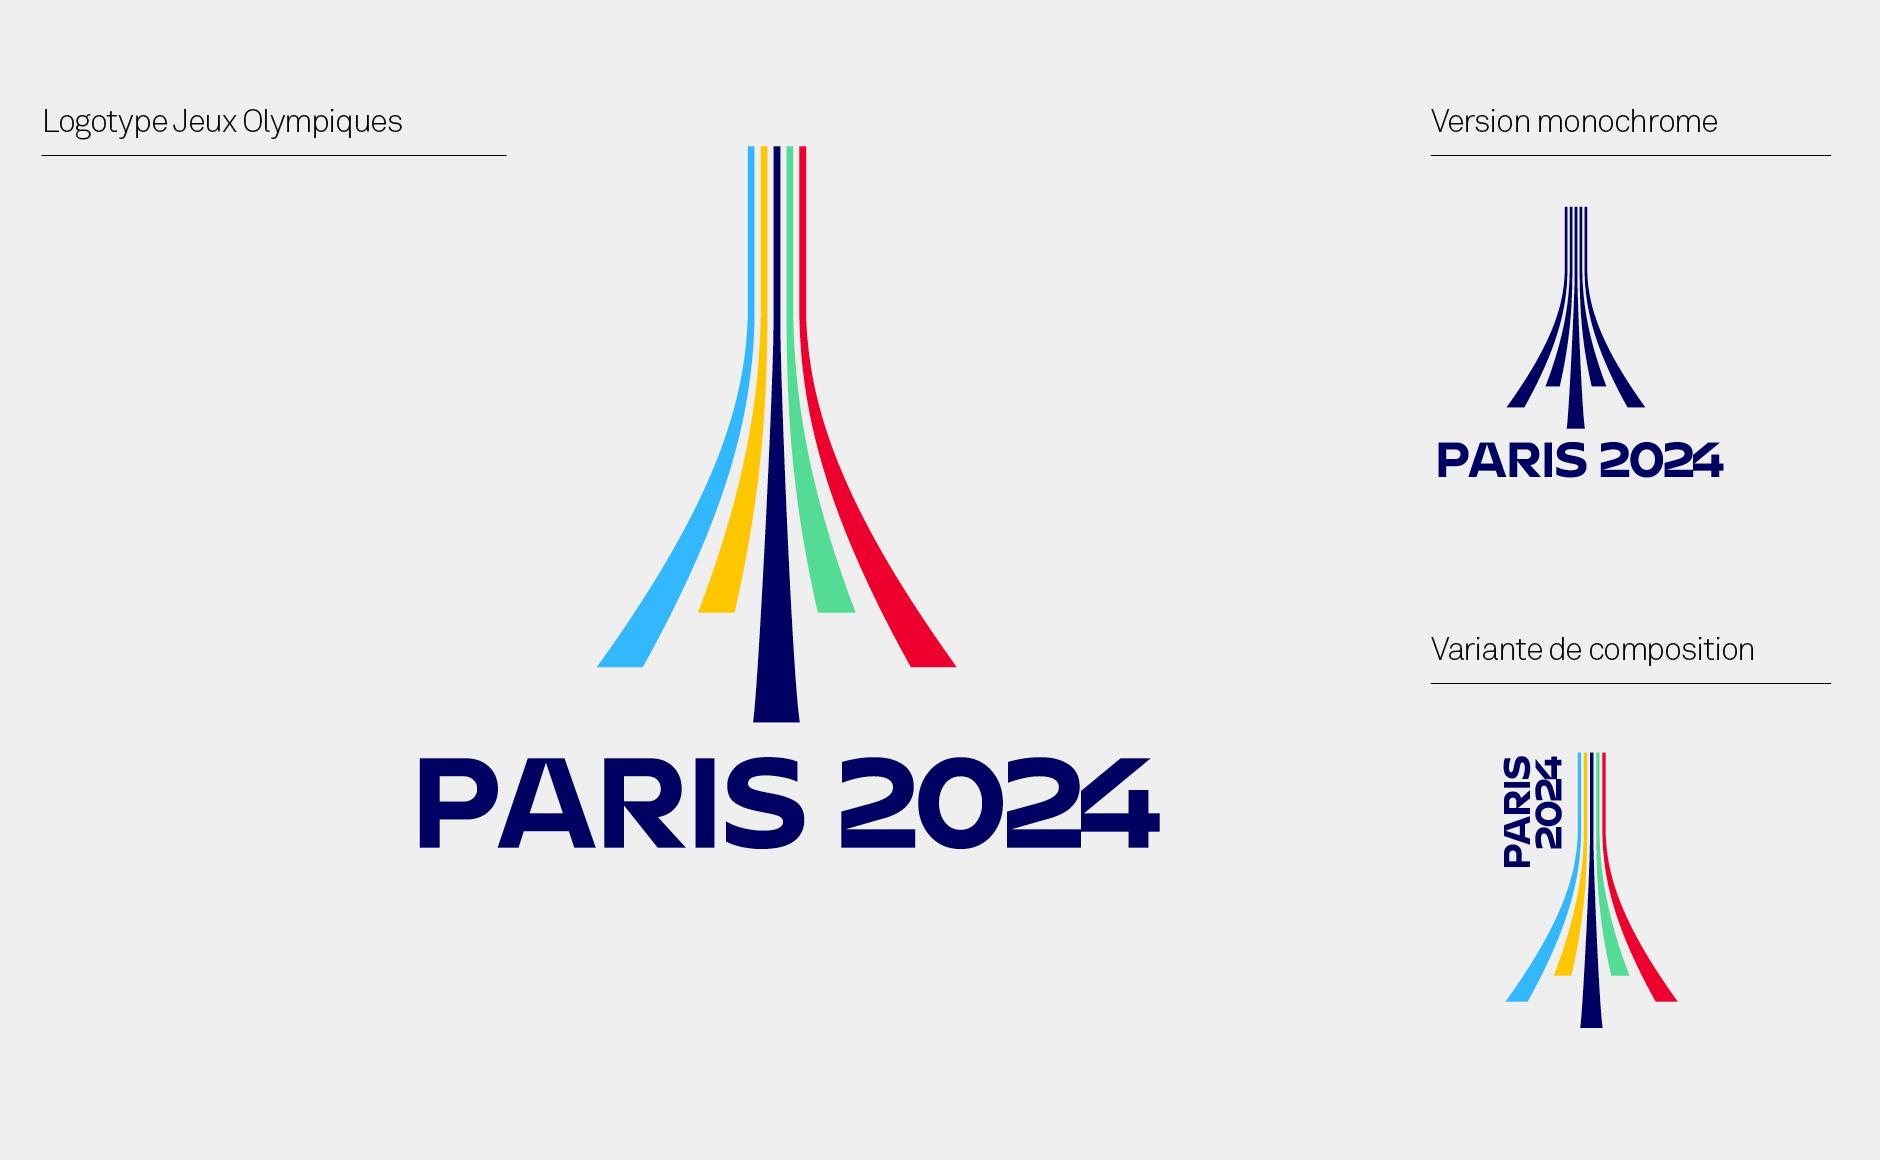 logo paris 2024 Olympic Games jeux olympiques